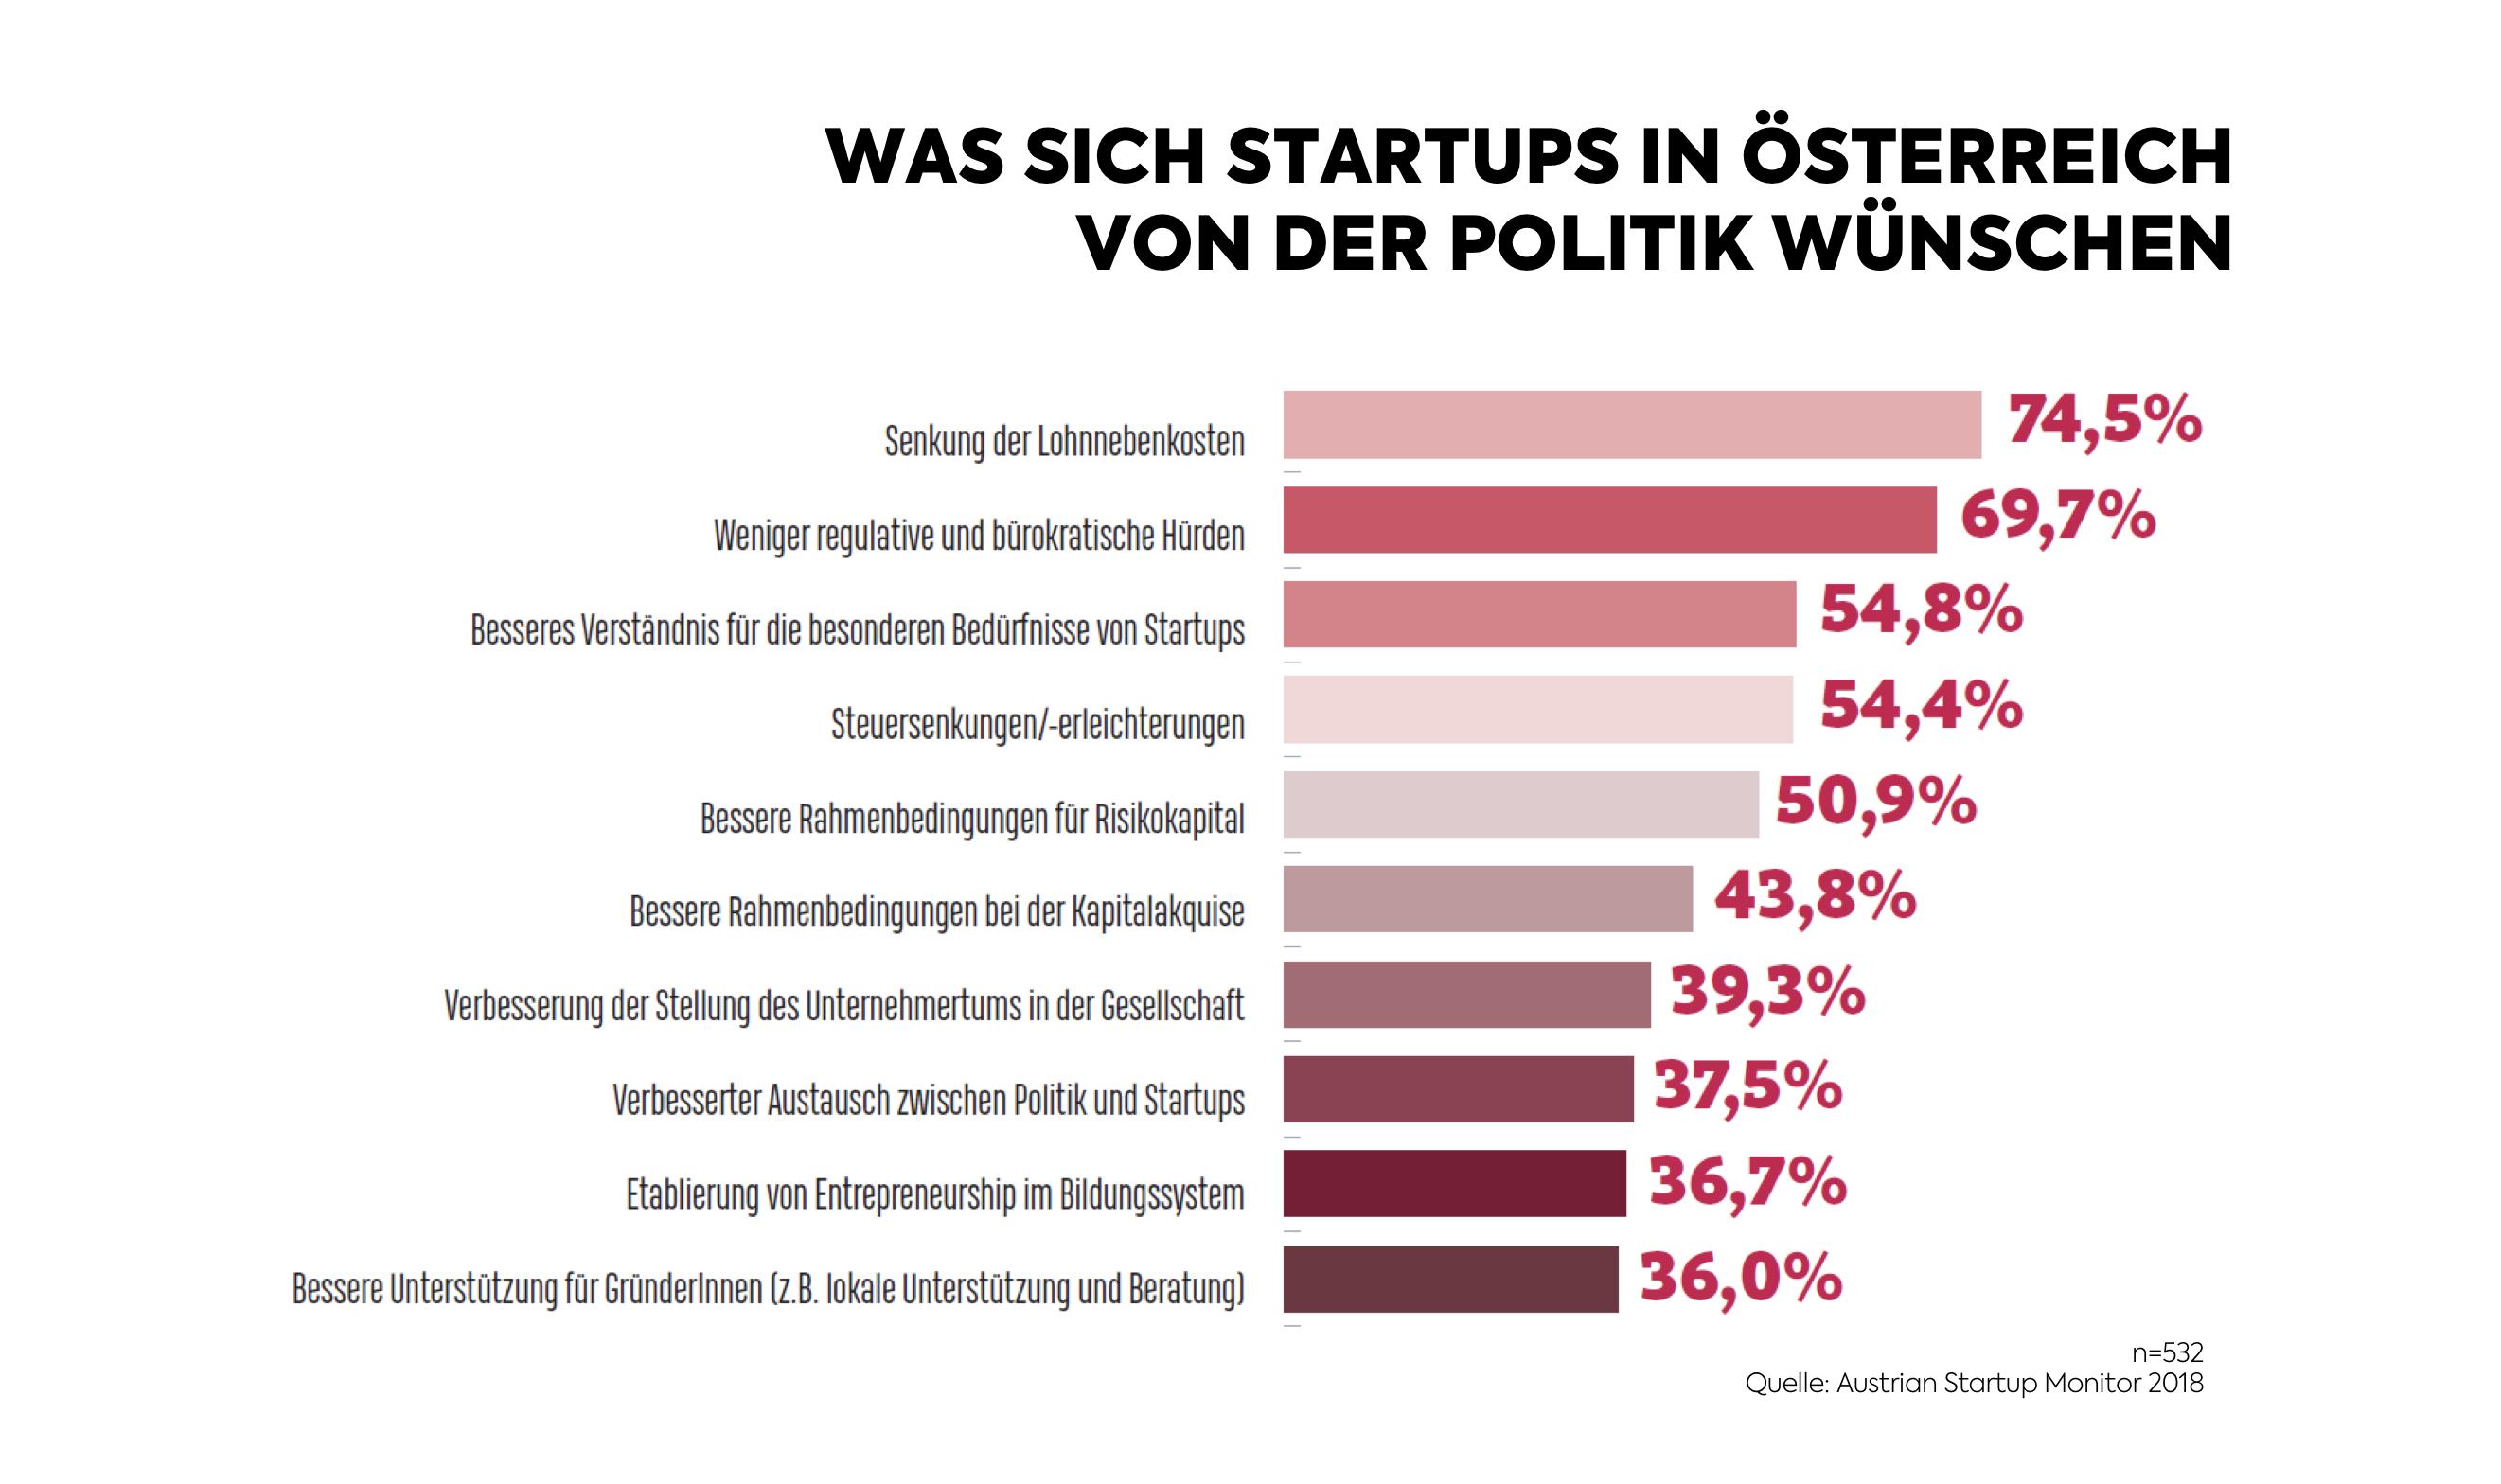 1. Austrian Startup Monitor - Politik